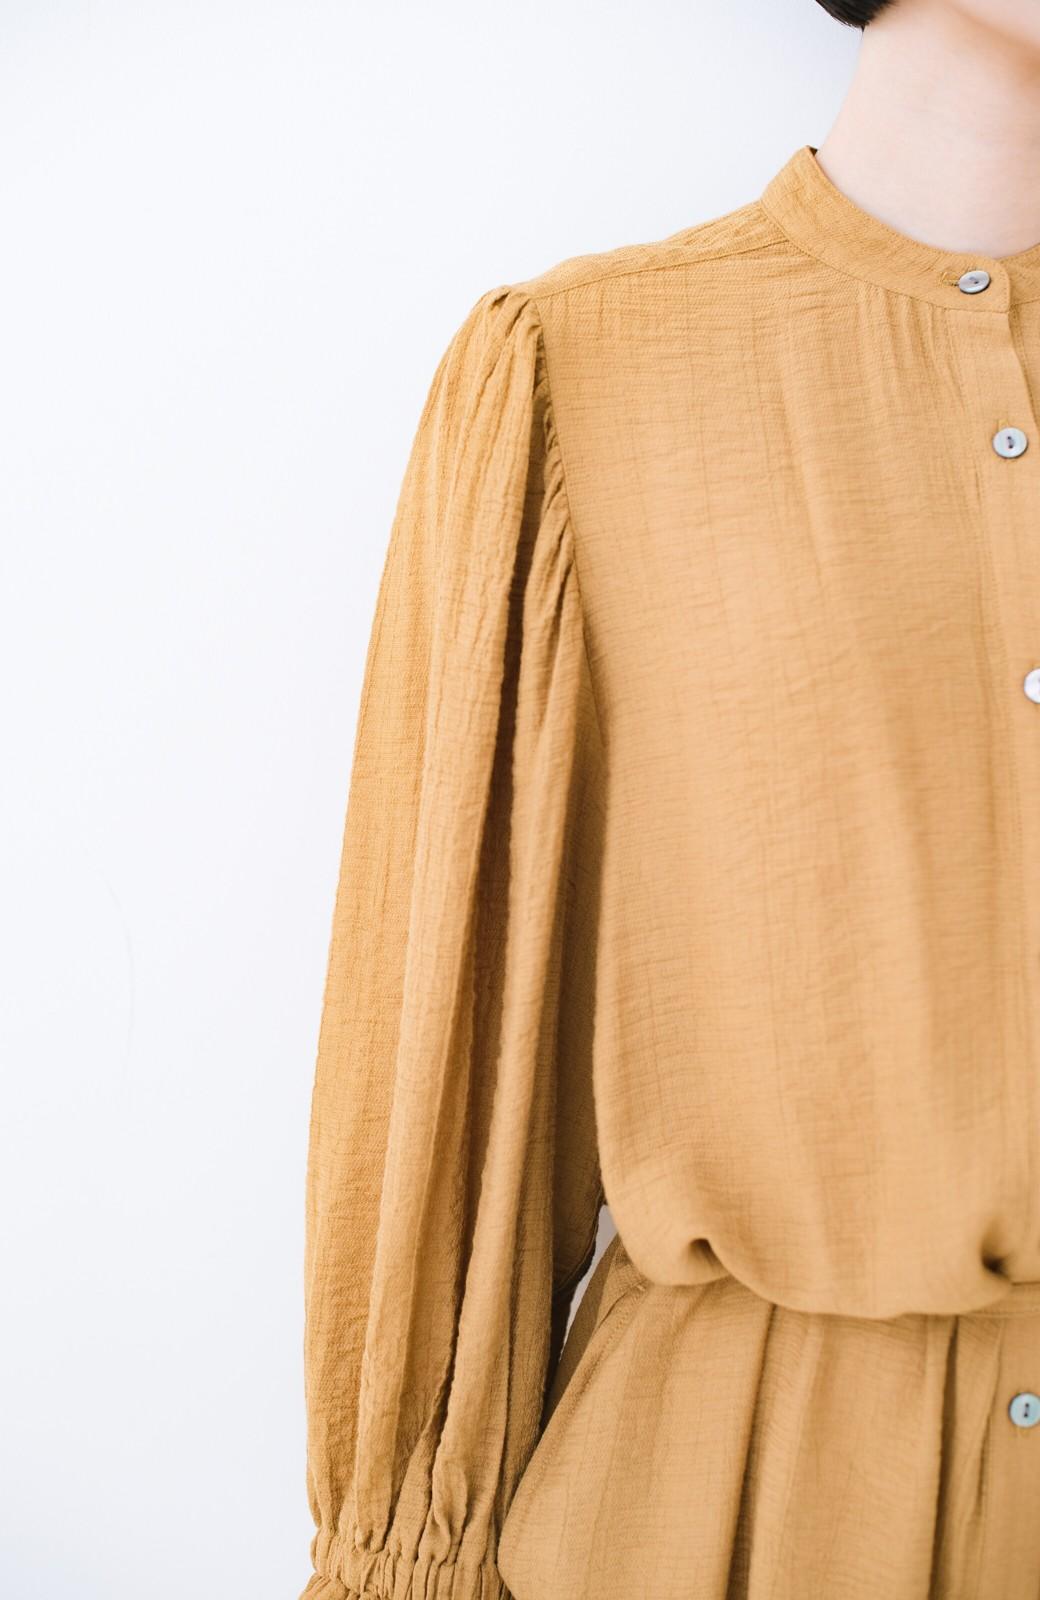 haco! 太ってもばれず 羽織っても便利なウエストリボンワンピース <マスタード>の商品写真6